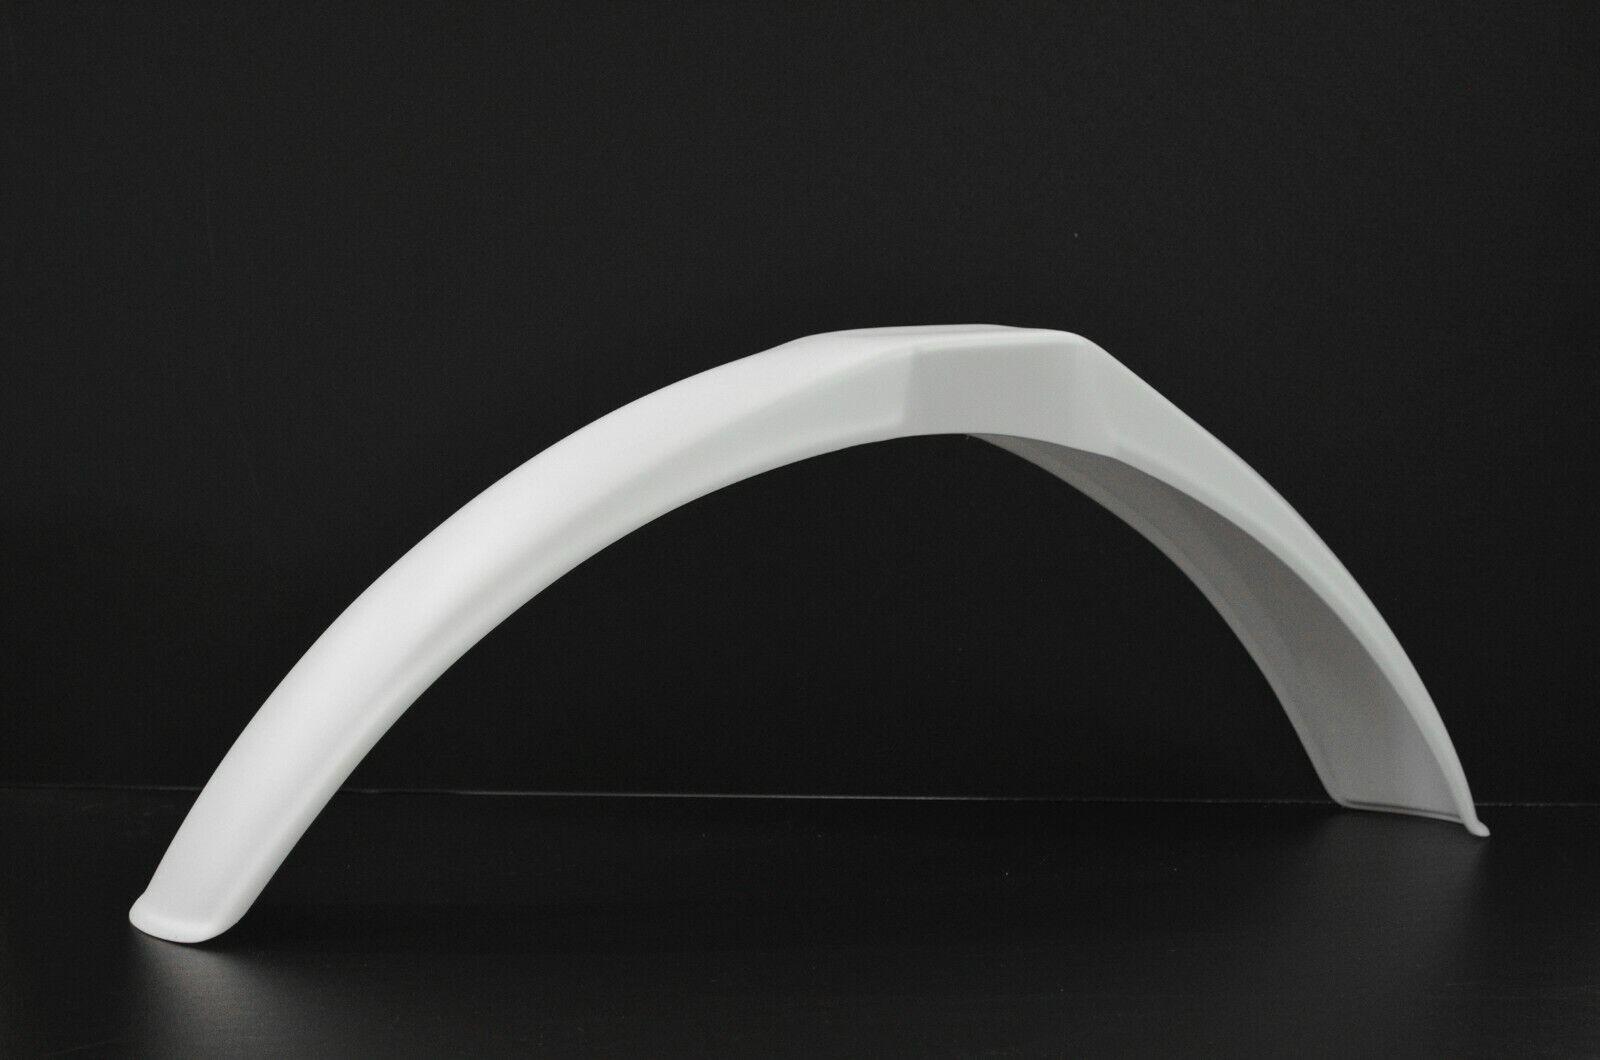 Garde boue avant type NAVA VIP blanc //White NAVA VIP front fender